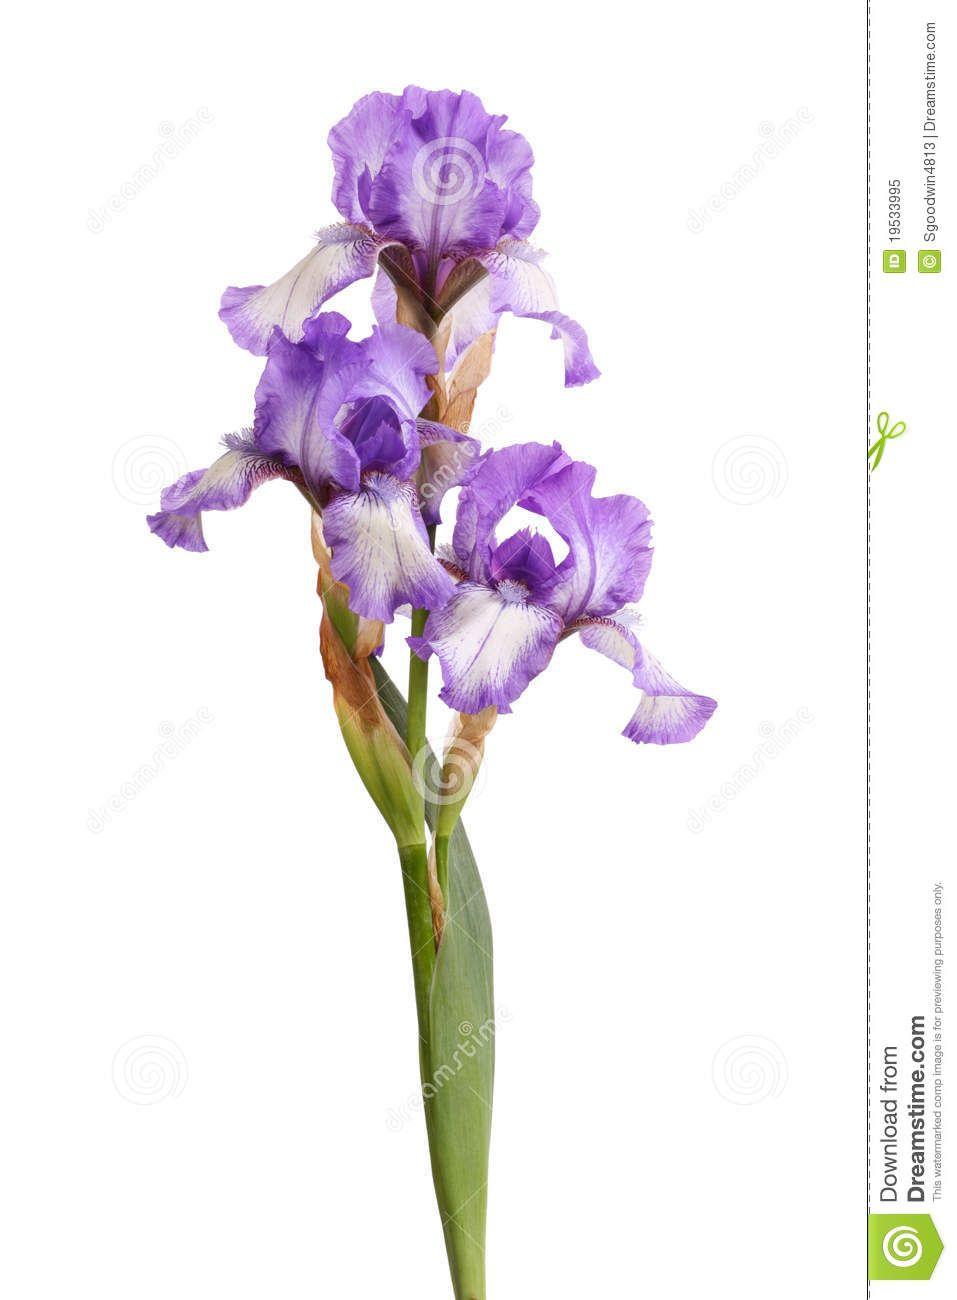 Stem purple iris flowers isolated white 19533995g 9571300 stem of purple iris flowers isolated on white izmirmasajfo Images